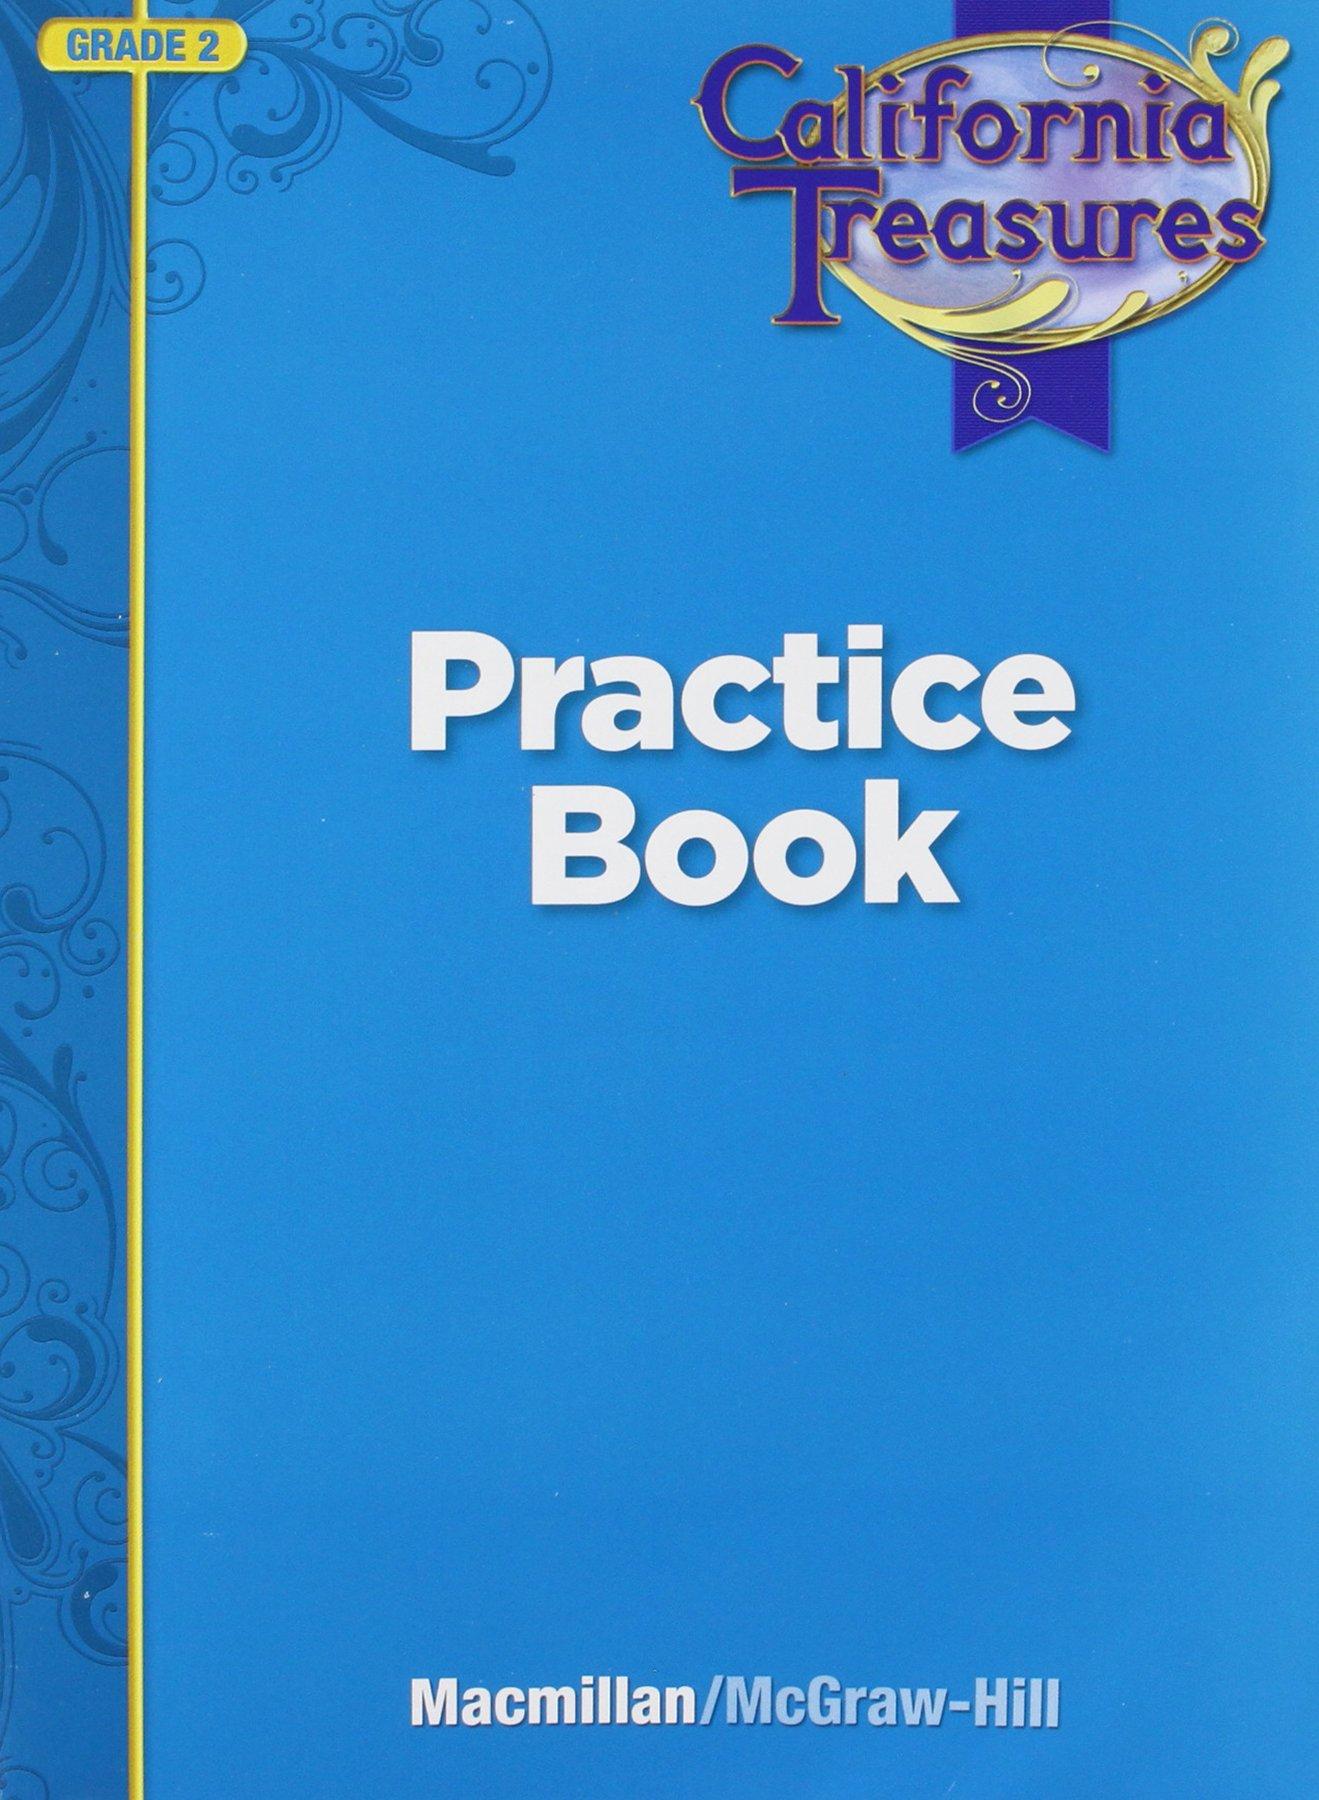 Worksheet Practice Book Grade 2 california treasures practice book grade 2 macmillan mcgraw hill 9780022018559 amazon com books